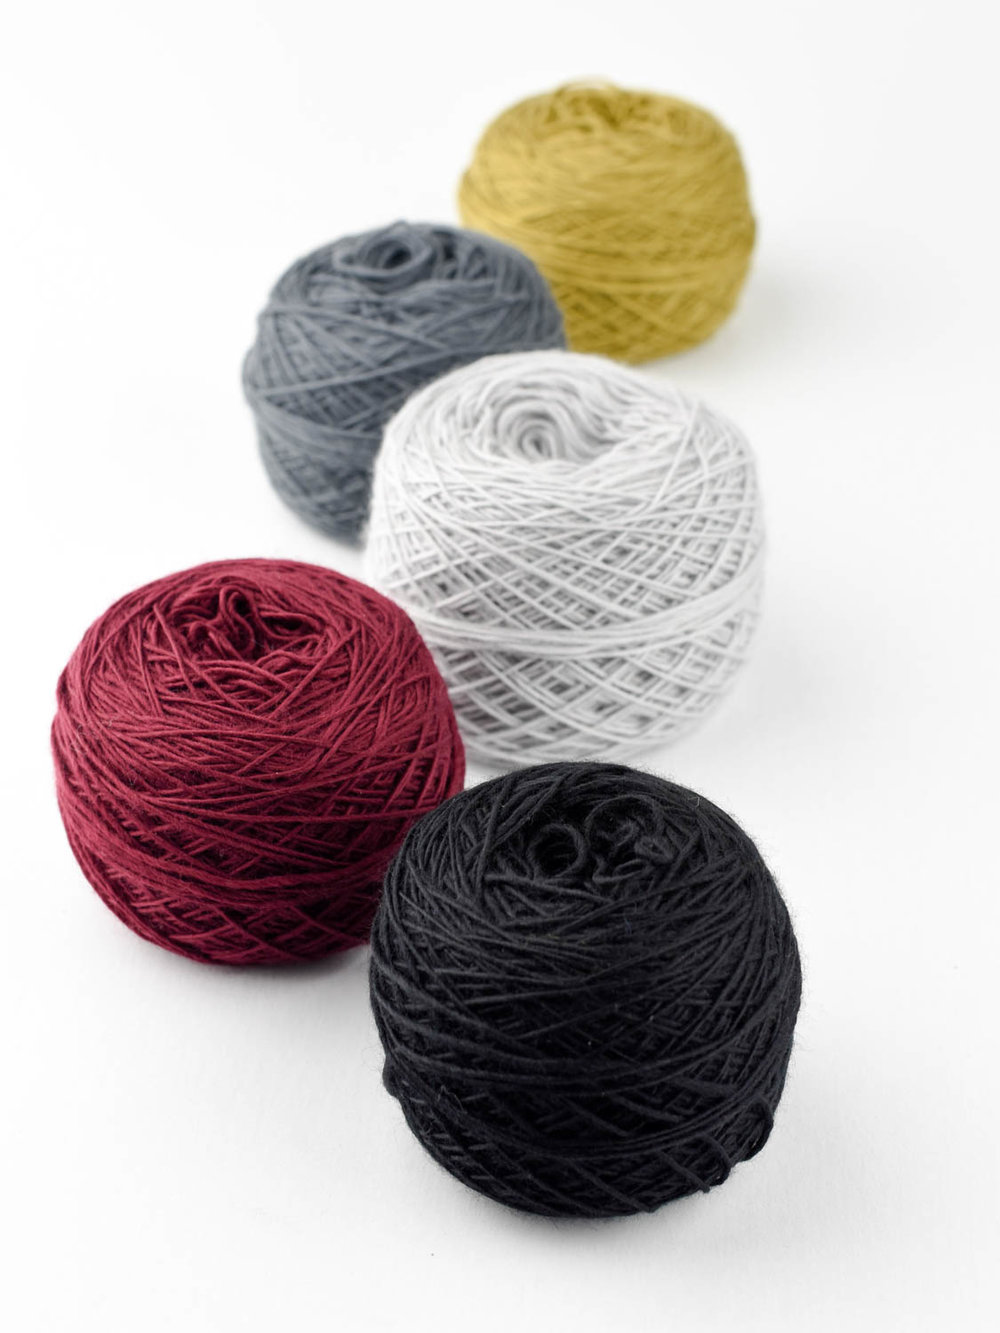 Shibui-knits-yarn-shipments.jpg